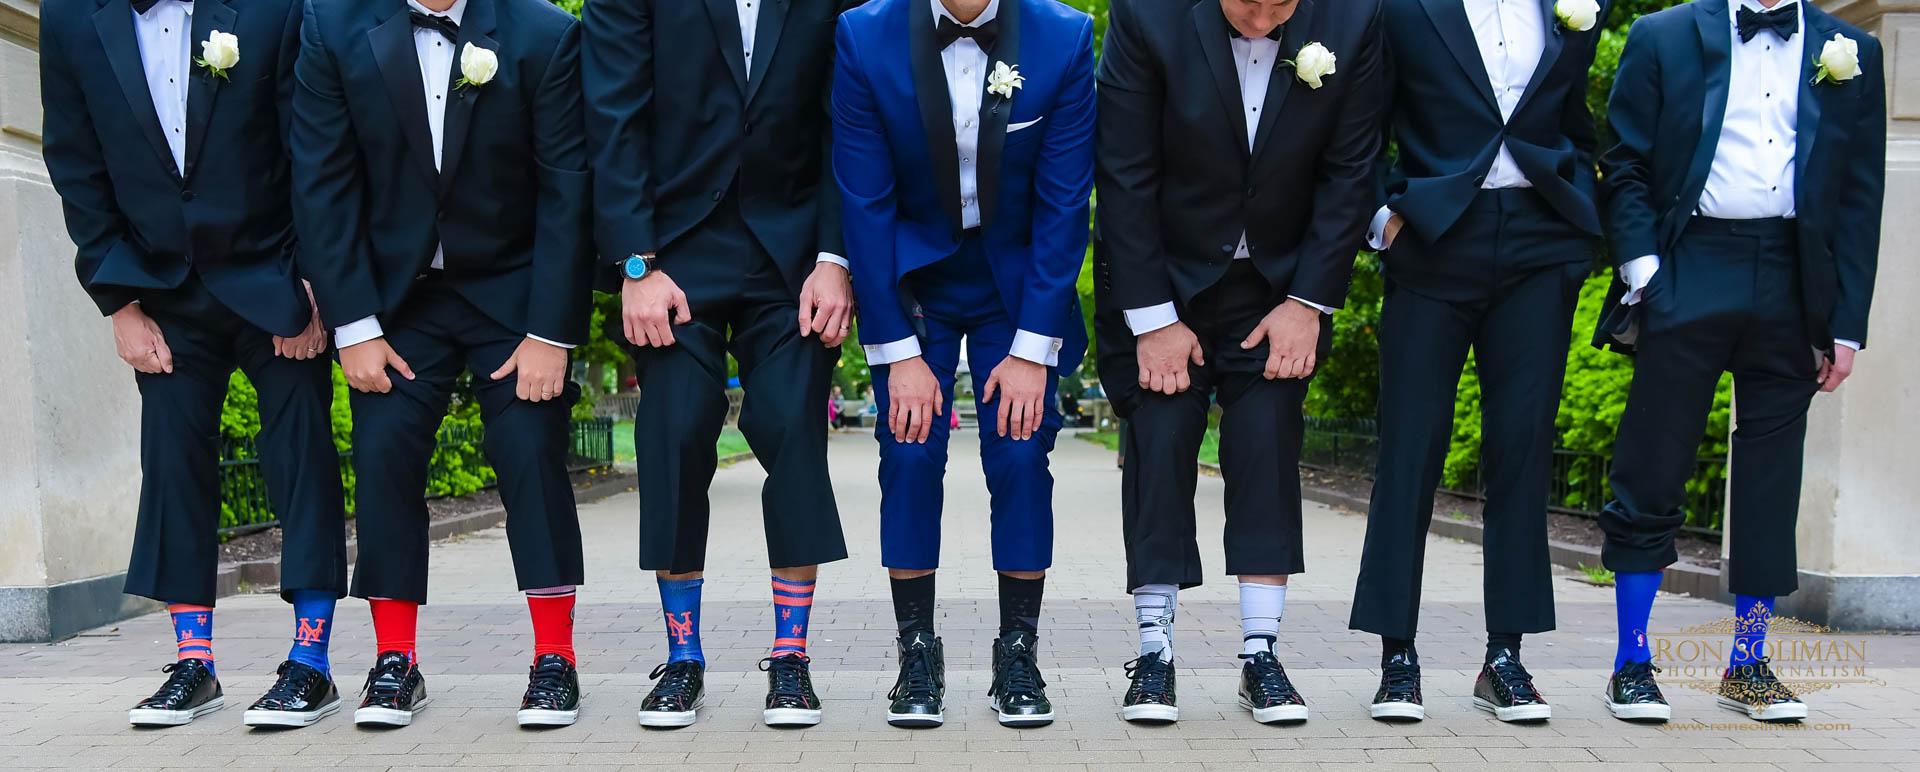 sports groomsman socks